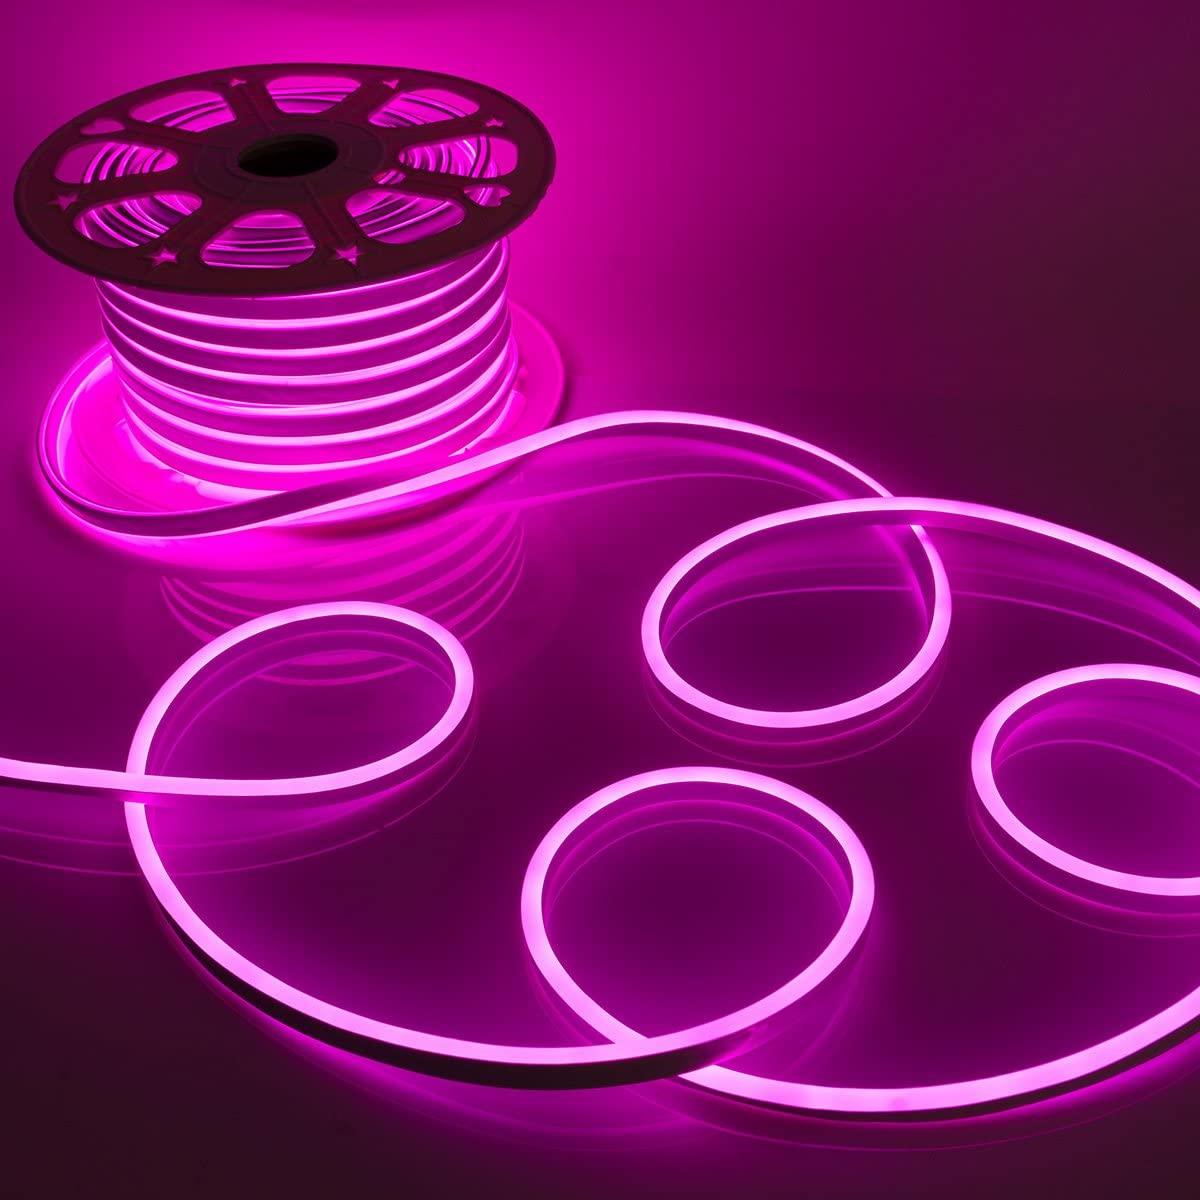 WYZworks Pink Flexible Waterproof Soft Single Side LED Neon Rope Light Strip Bar 50FT